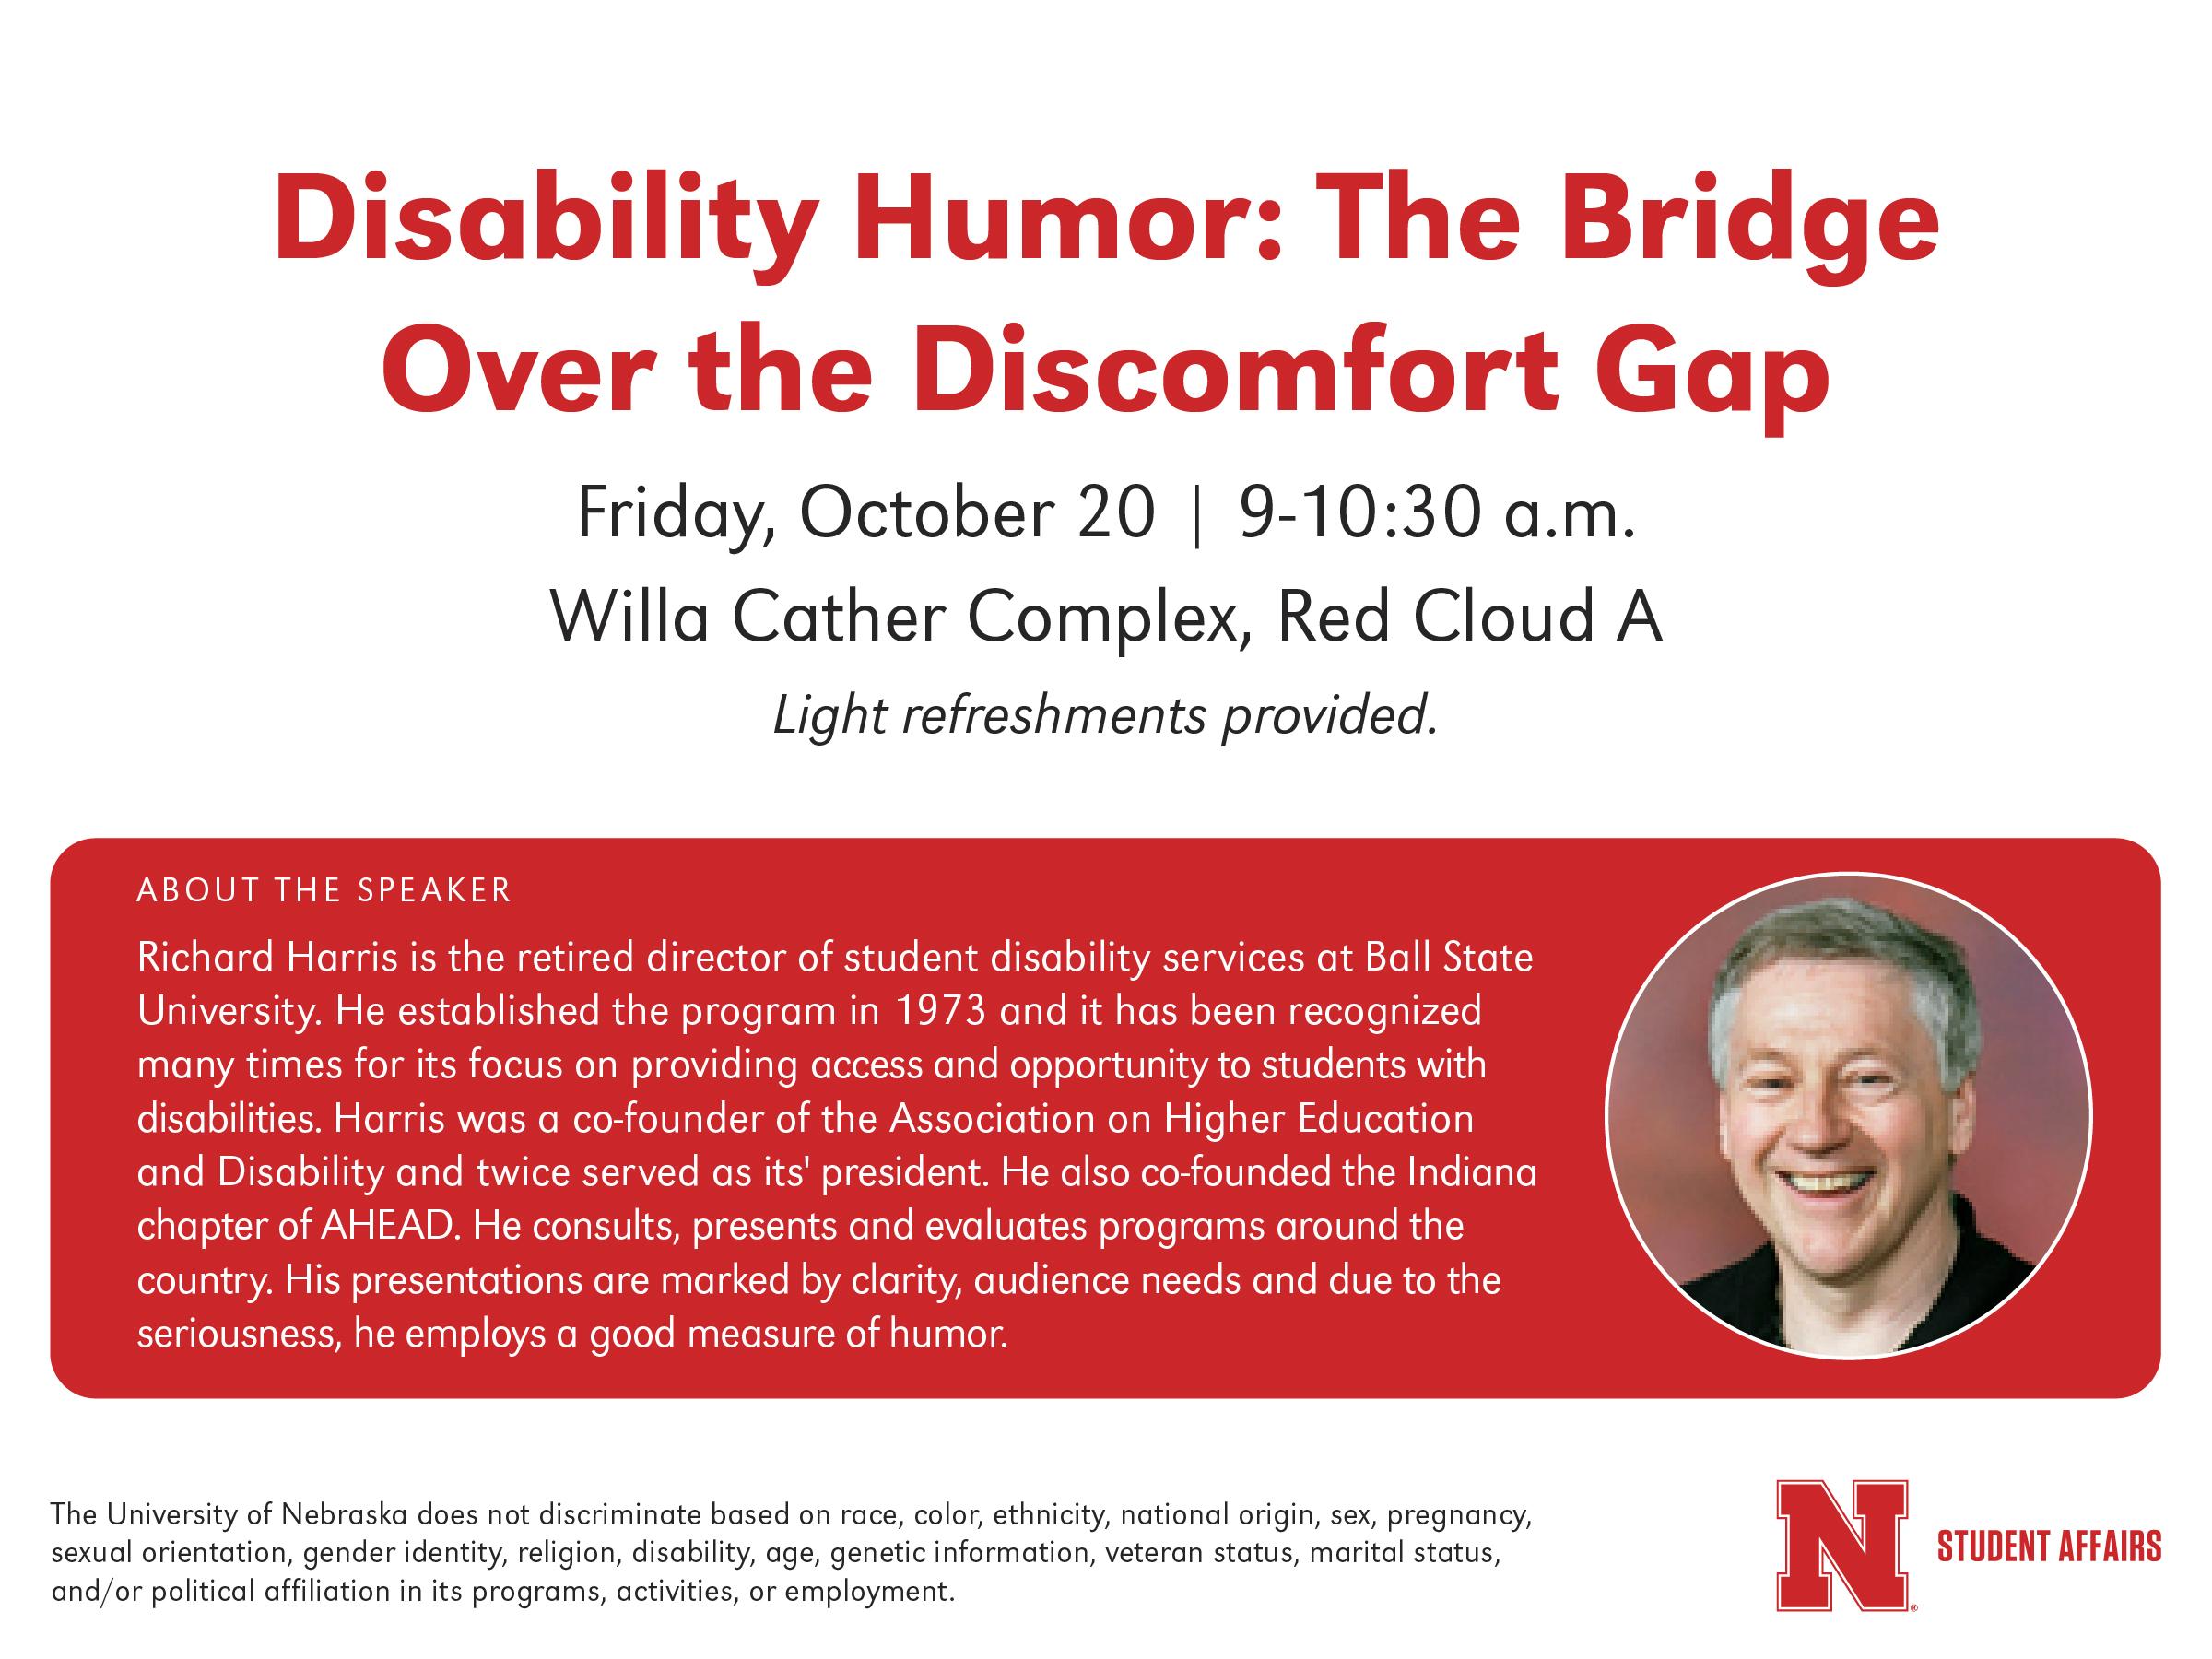 "Richard Harris will present ""Disability Humor: The Bridge Over the Discomfort Gap"" on Friday, Oct. 20, 2017 at the University of Nebraska-Lincoln."